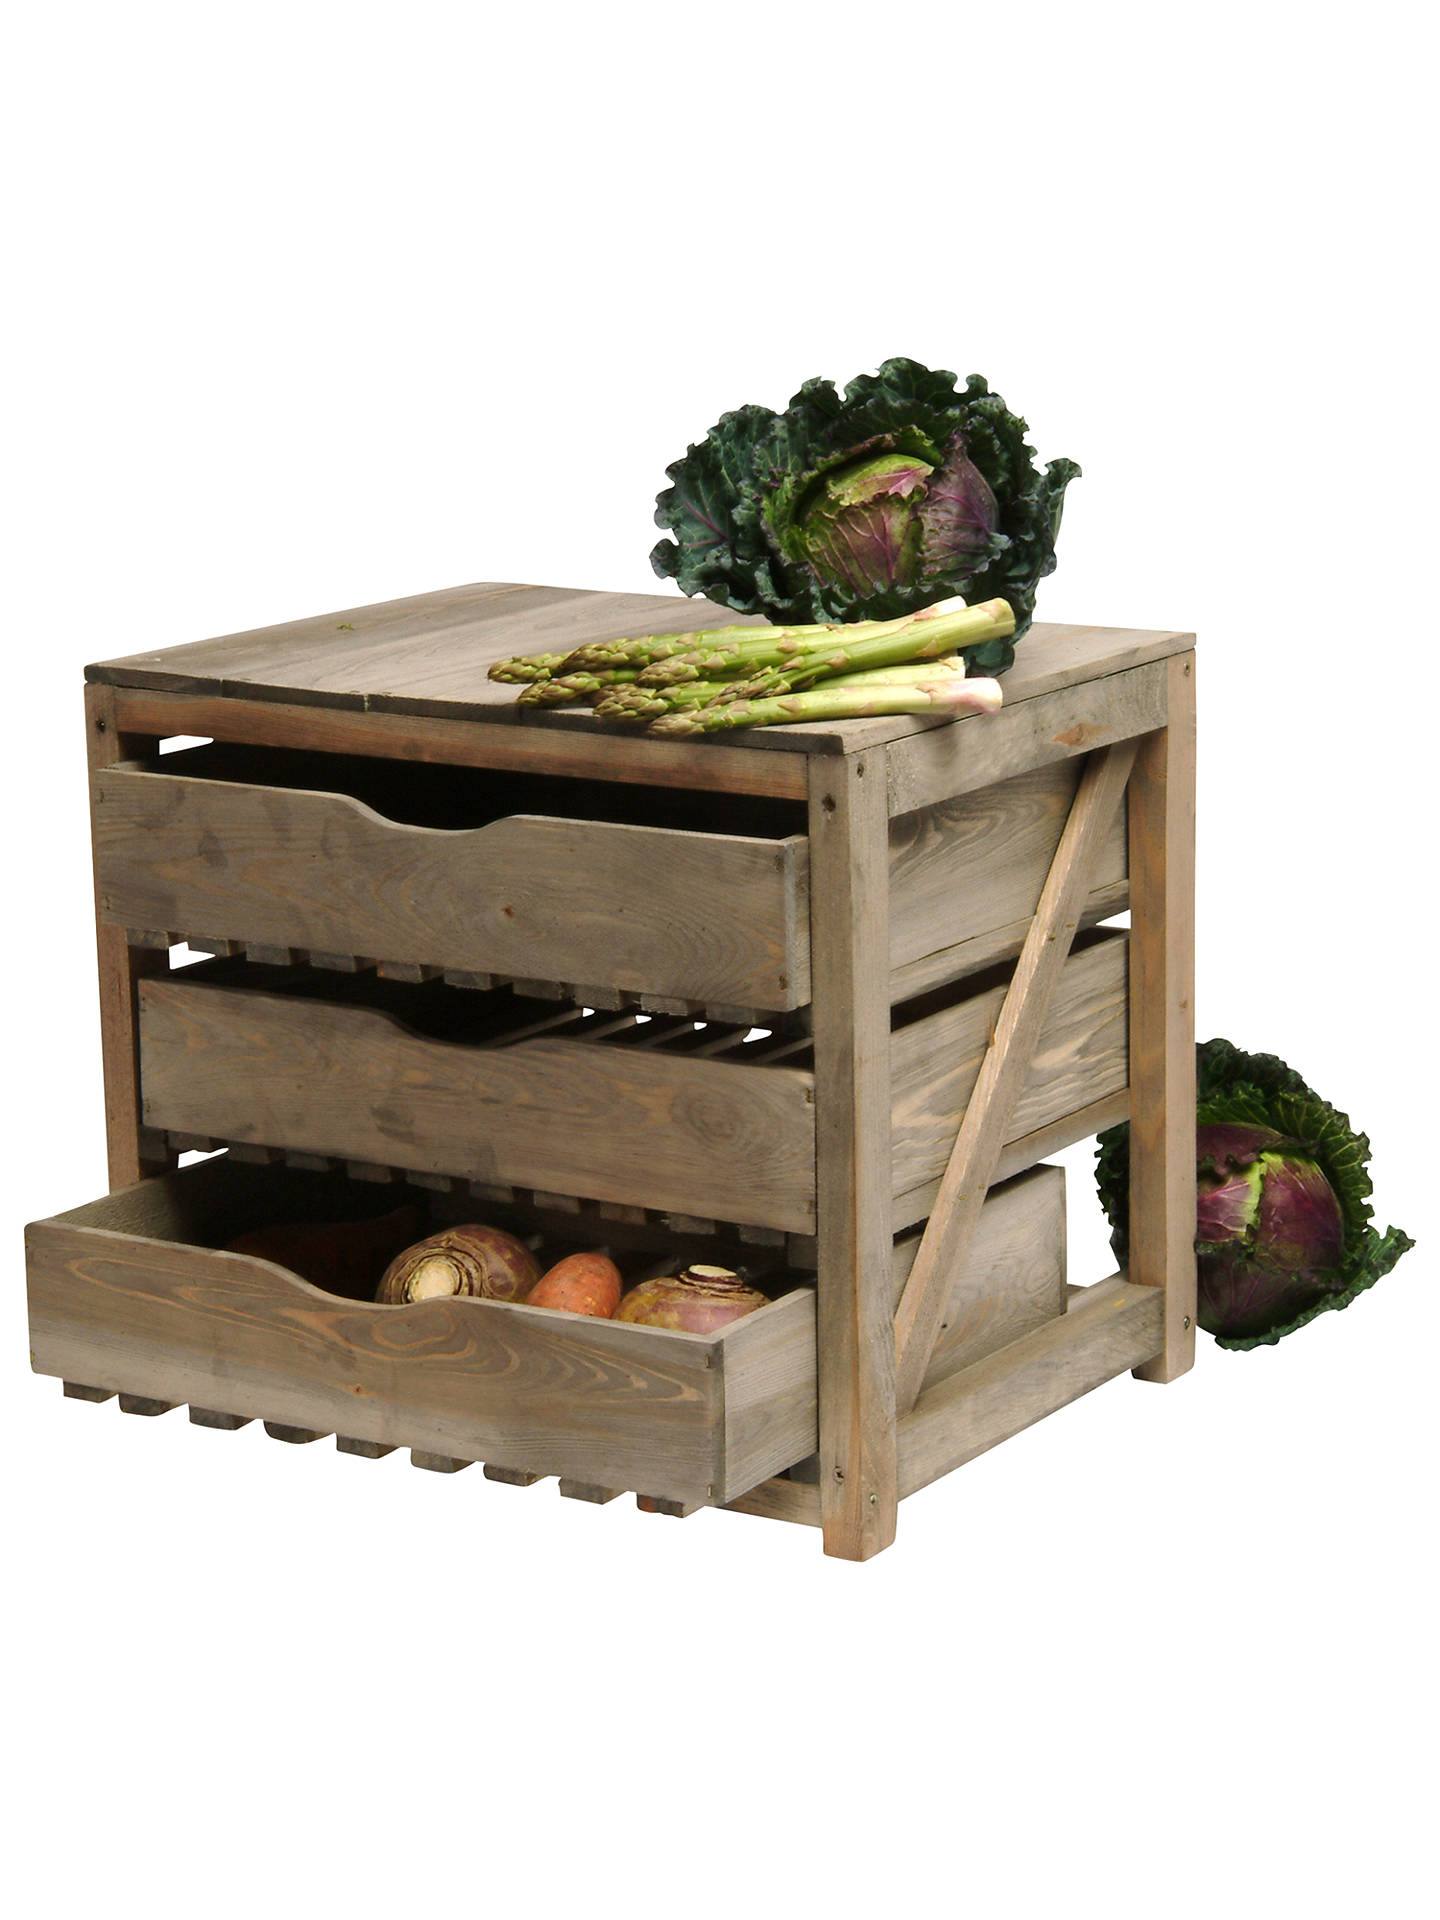 Leisure Traders Wooden Fruit and Vegetable Storage Rack